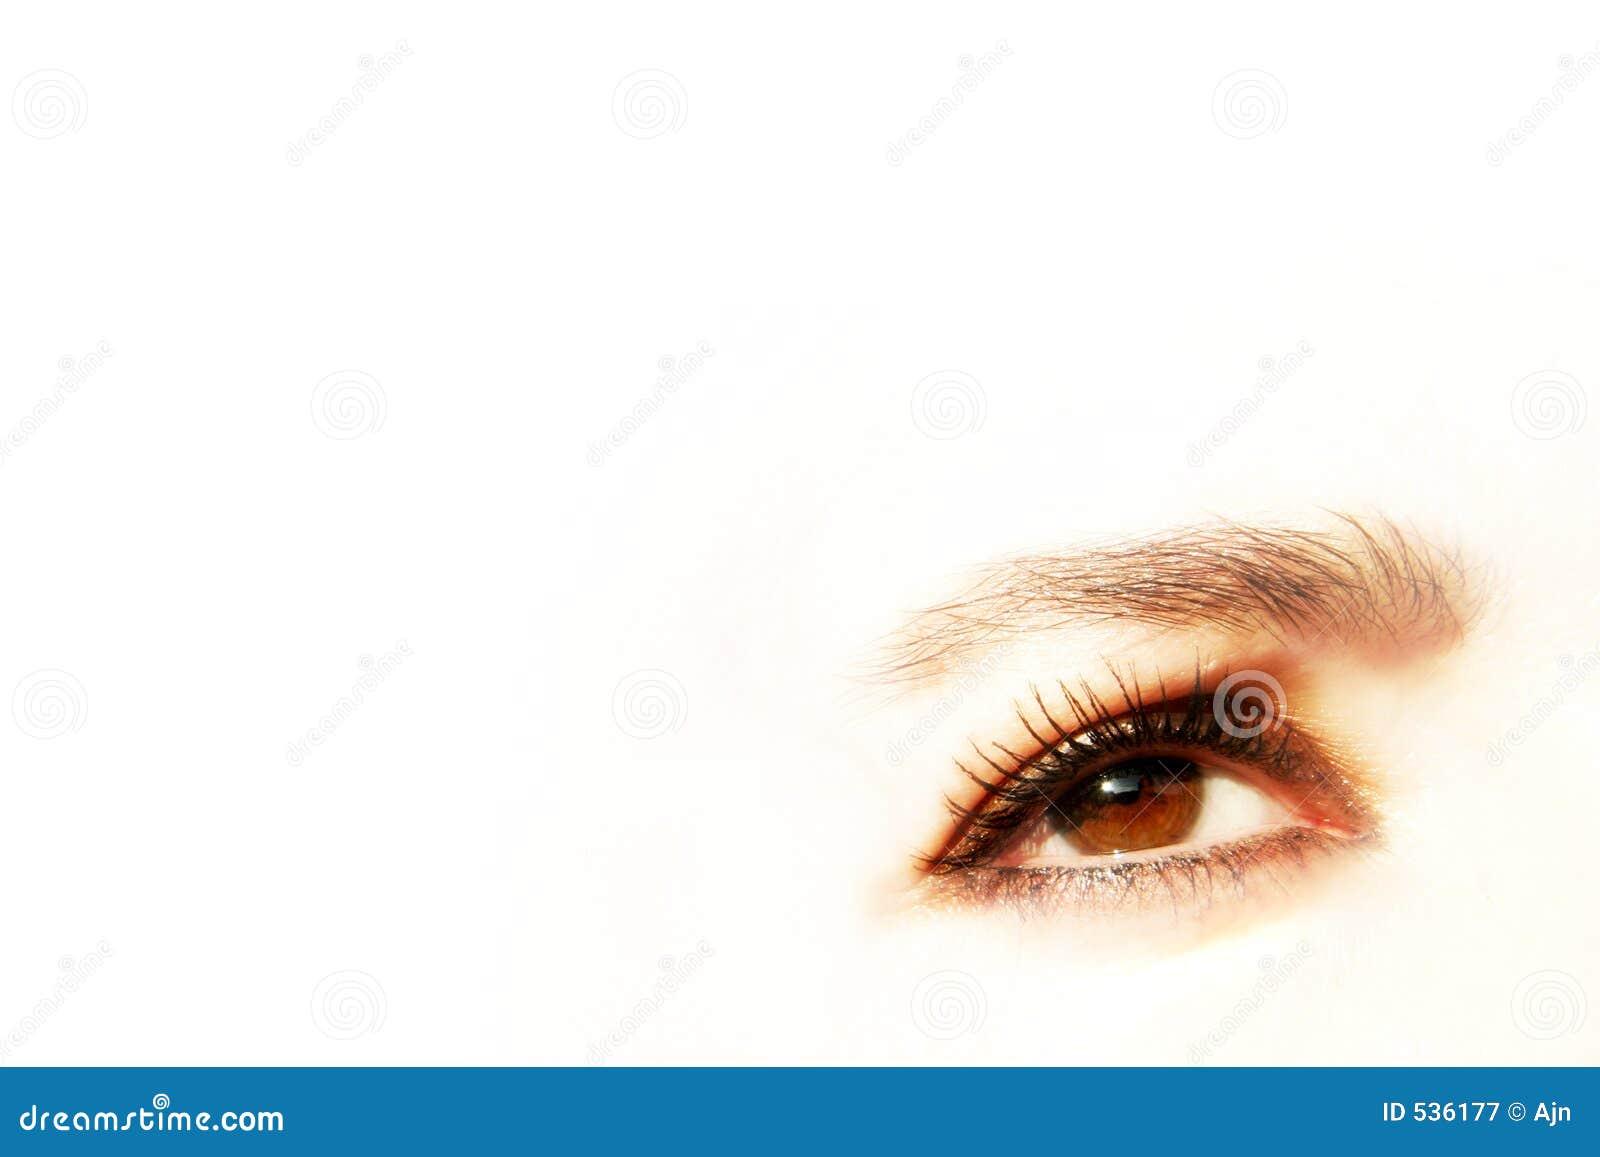 Download 迷人的眼睛 库存图片. 图片 包括有 browne, 女性, 查找, 魅力, 夫人, 虹膜, 妇女, 空白, 亮光 - 536177